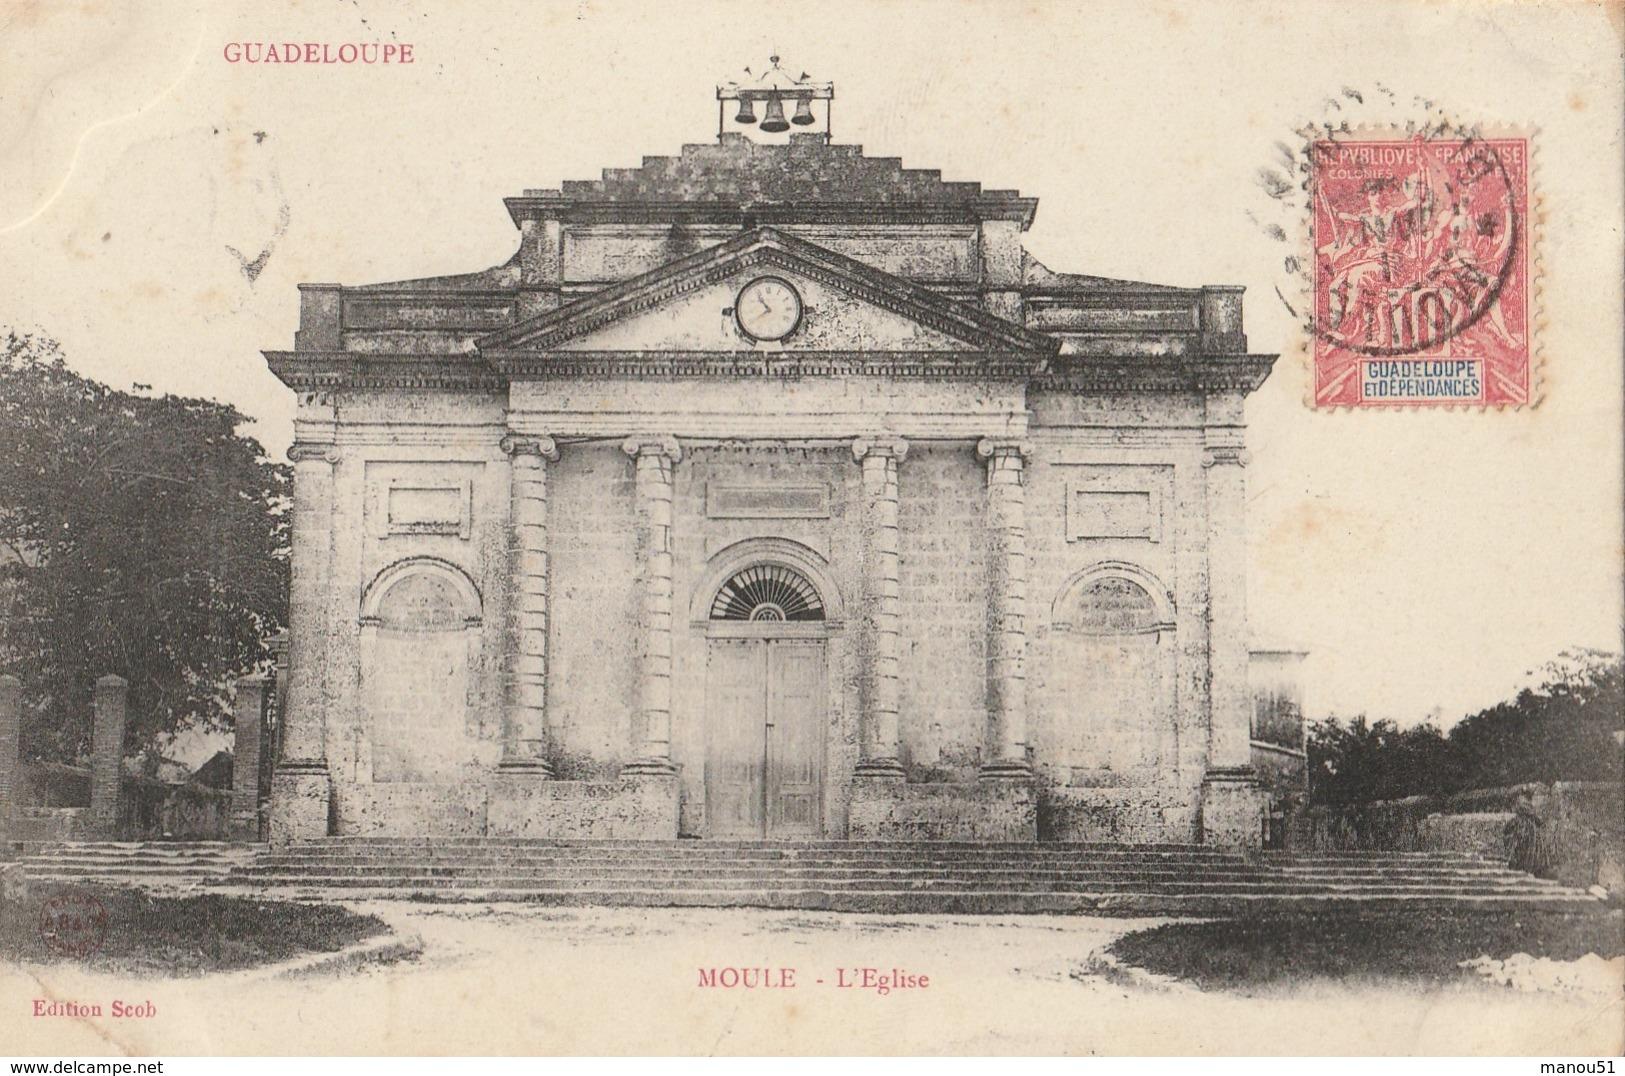 GUADELOUPE - MOULE  L'Eglise - Guadeloupe